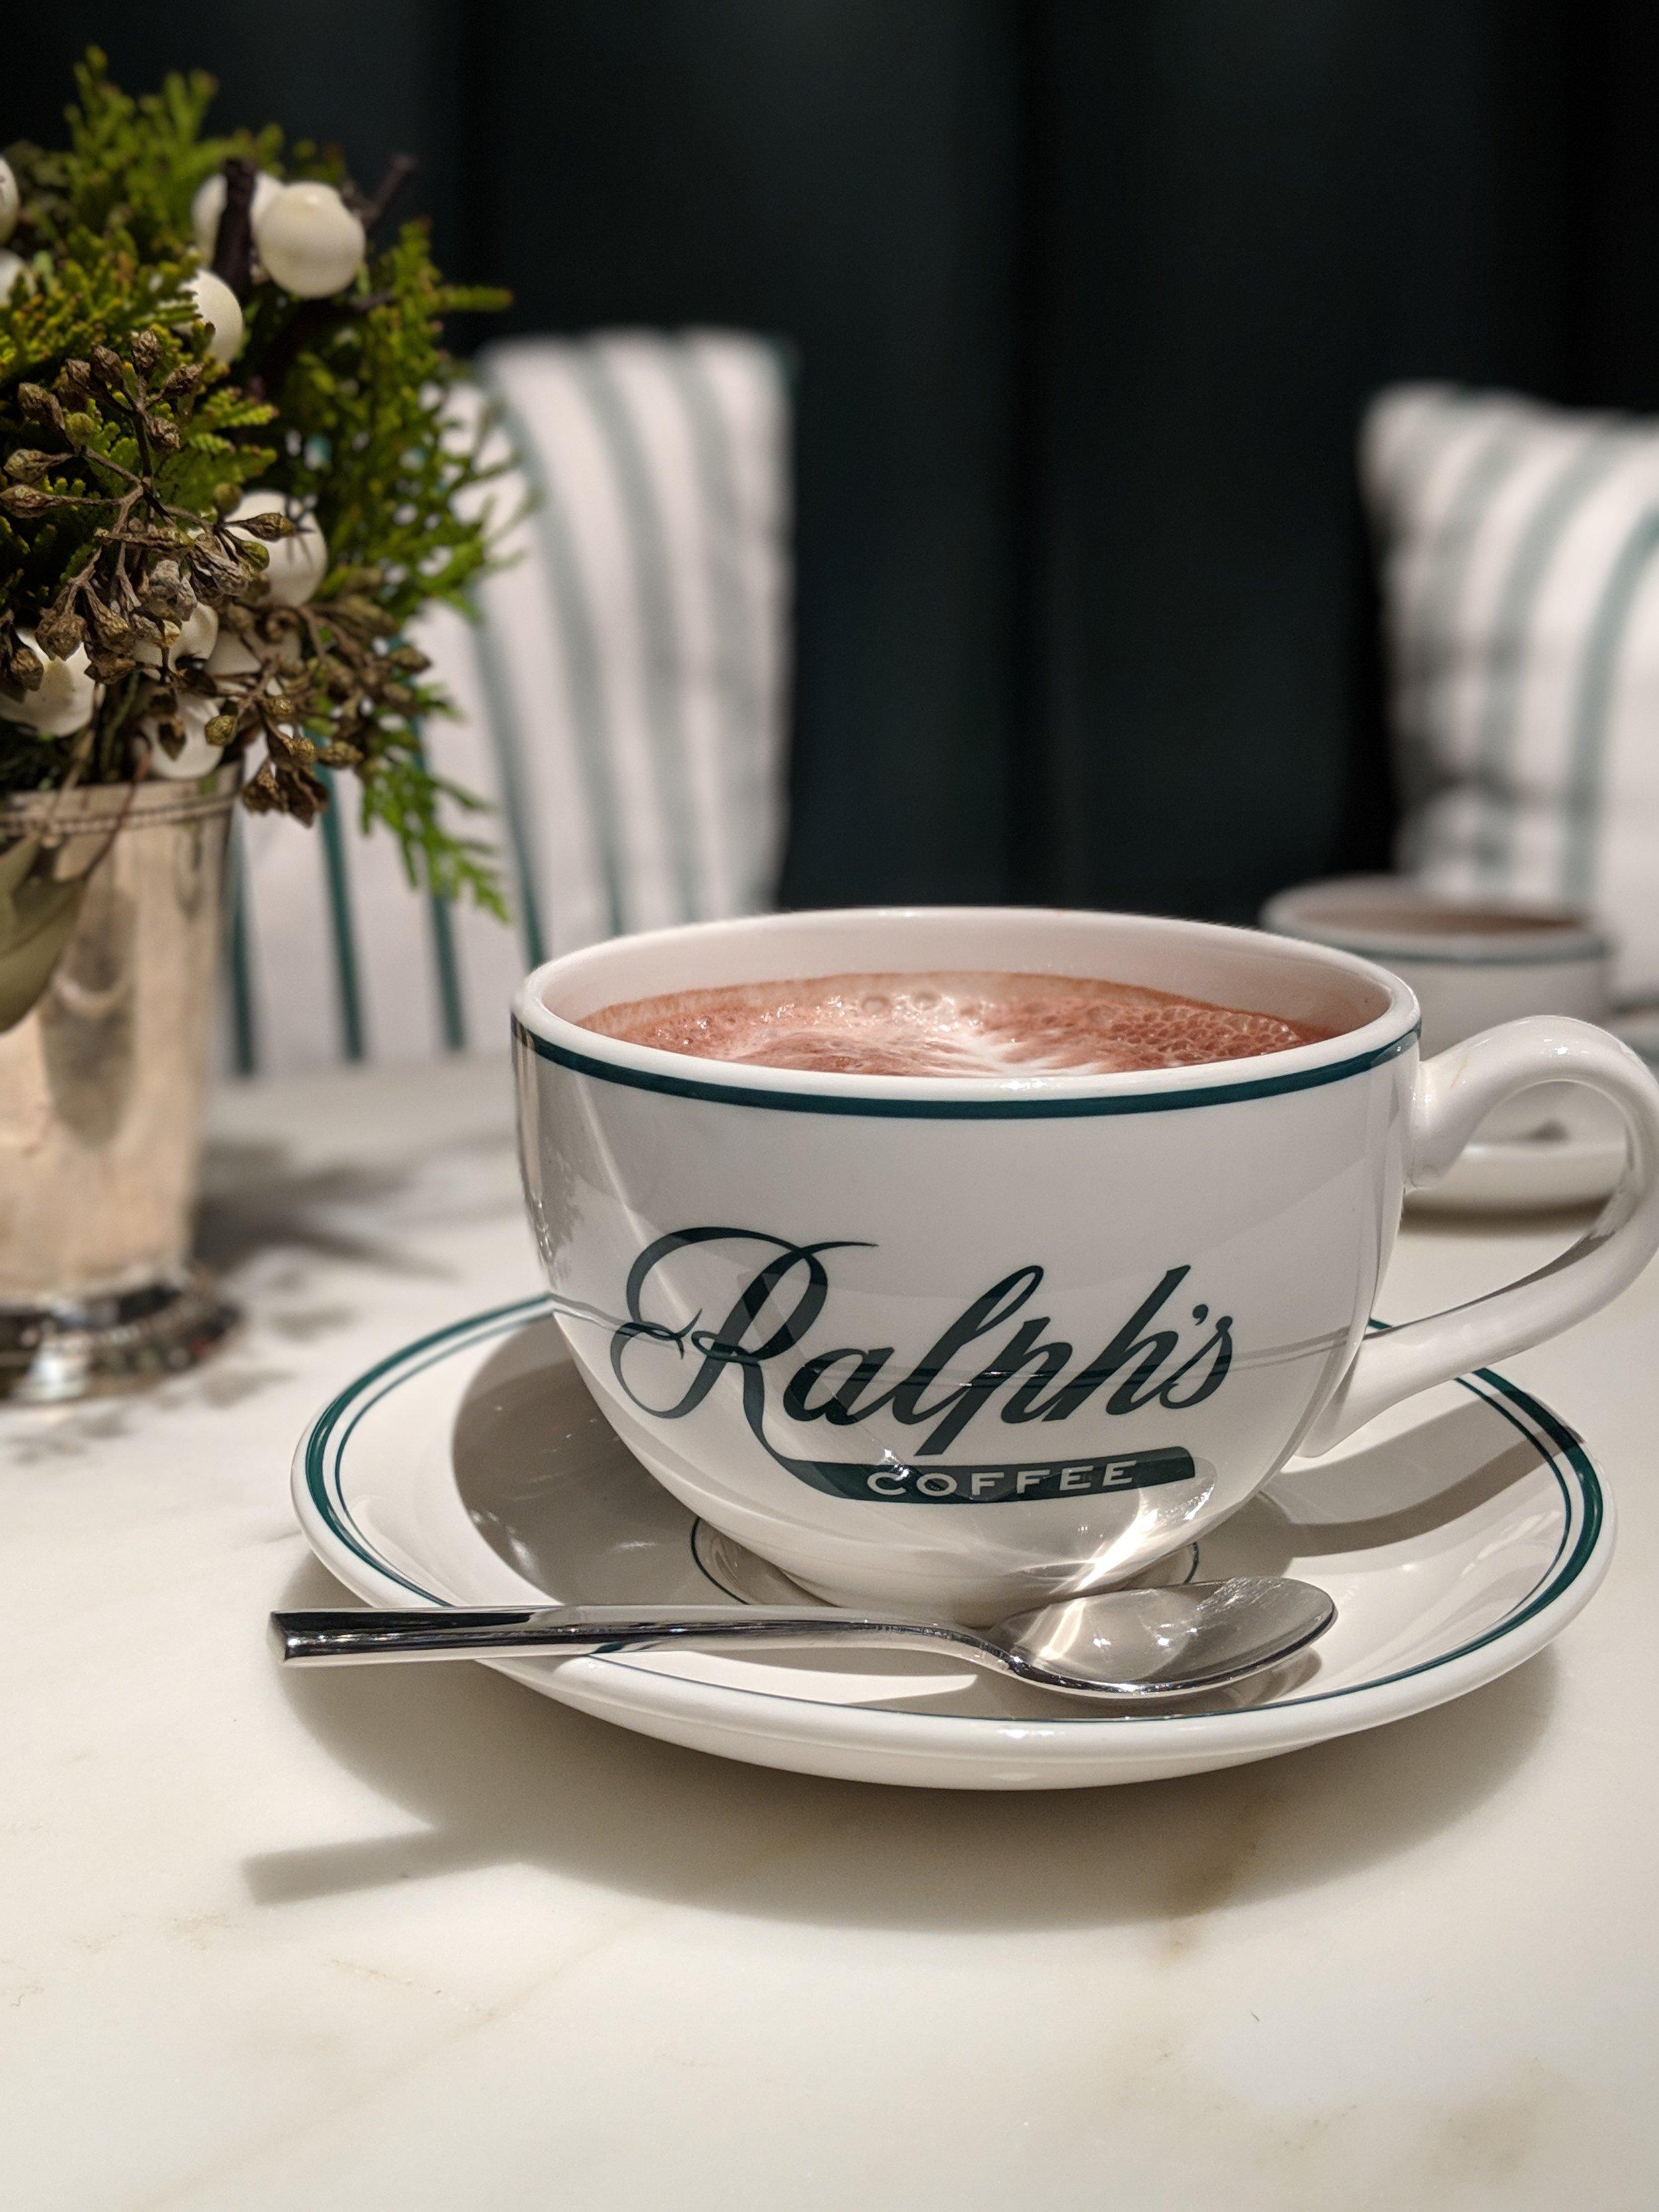 My new favorite coffee shop:  Ralph's Coffee  inside Ralph Lauren